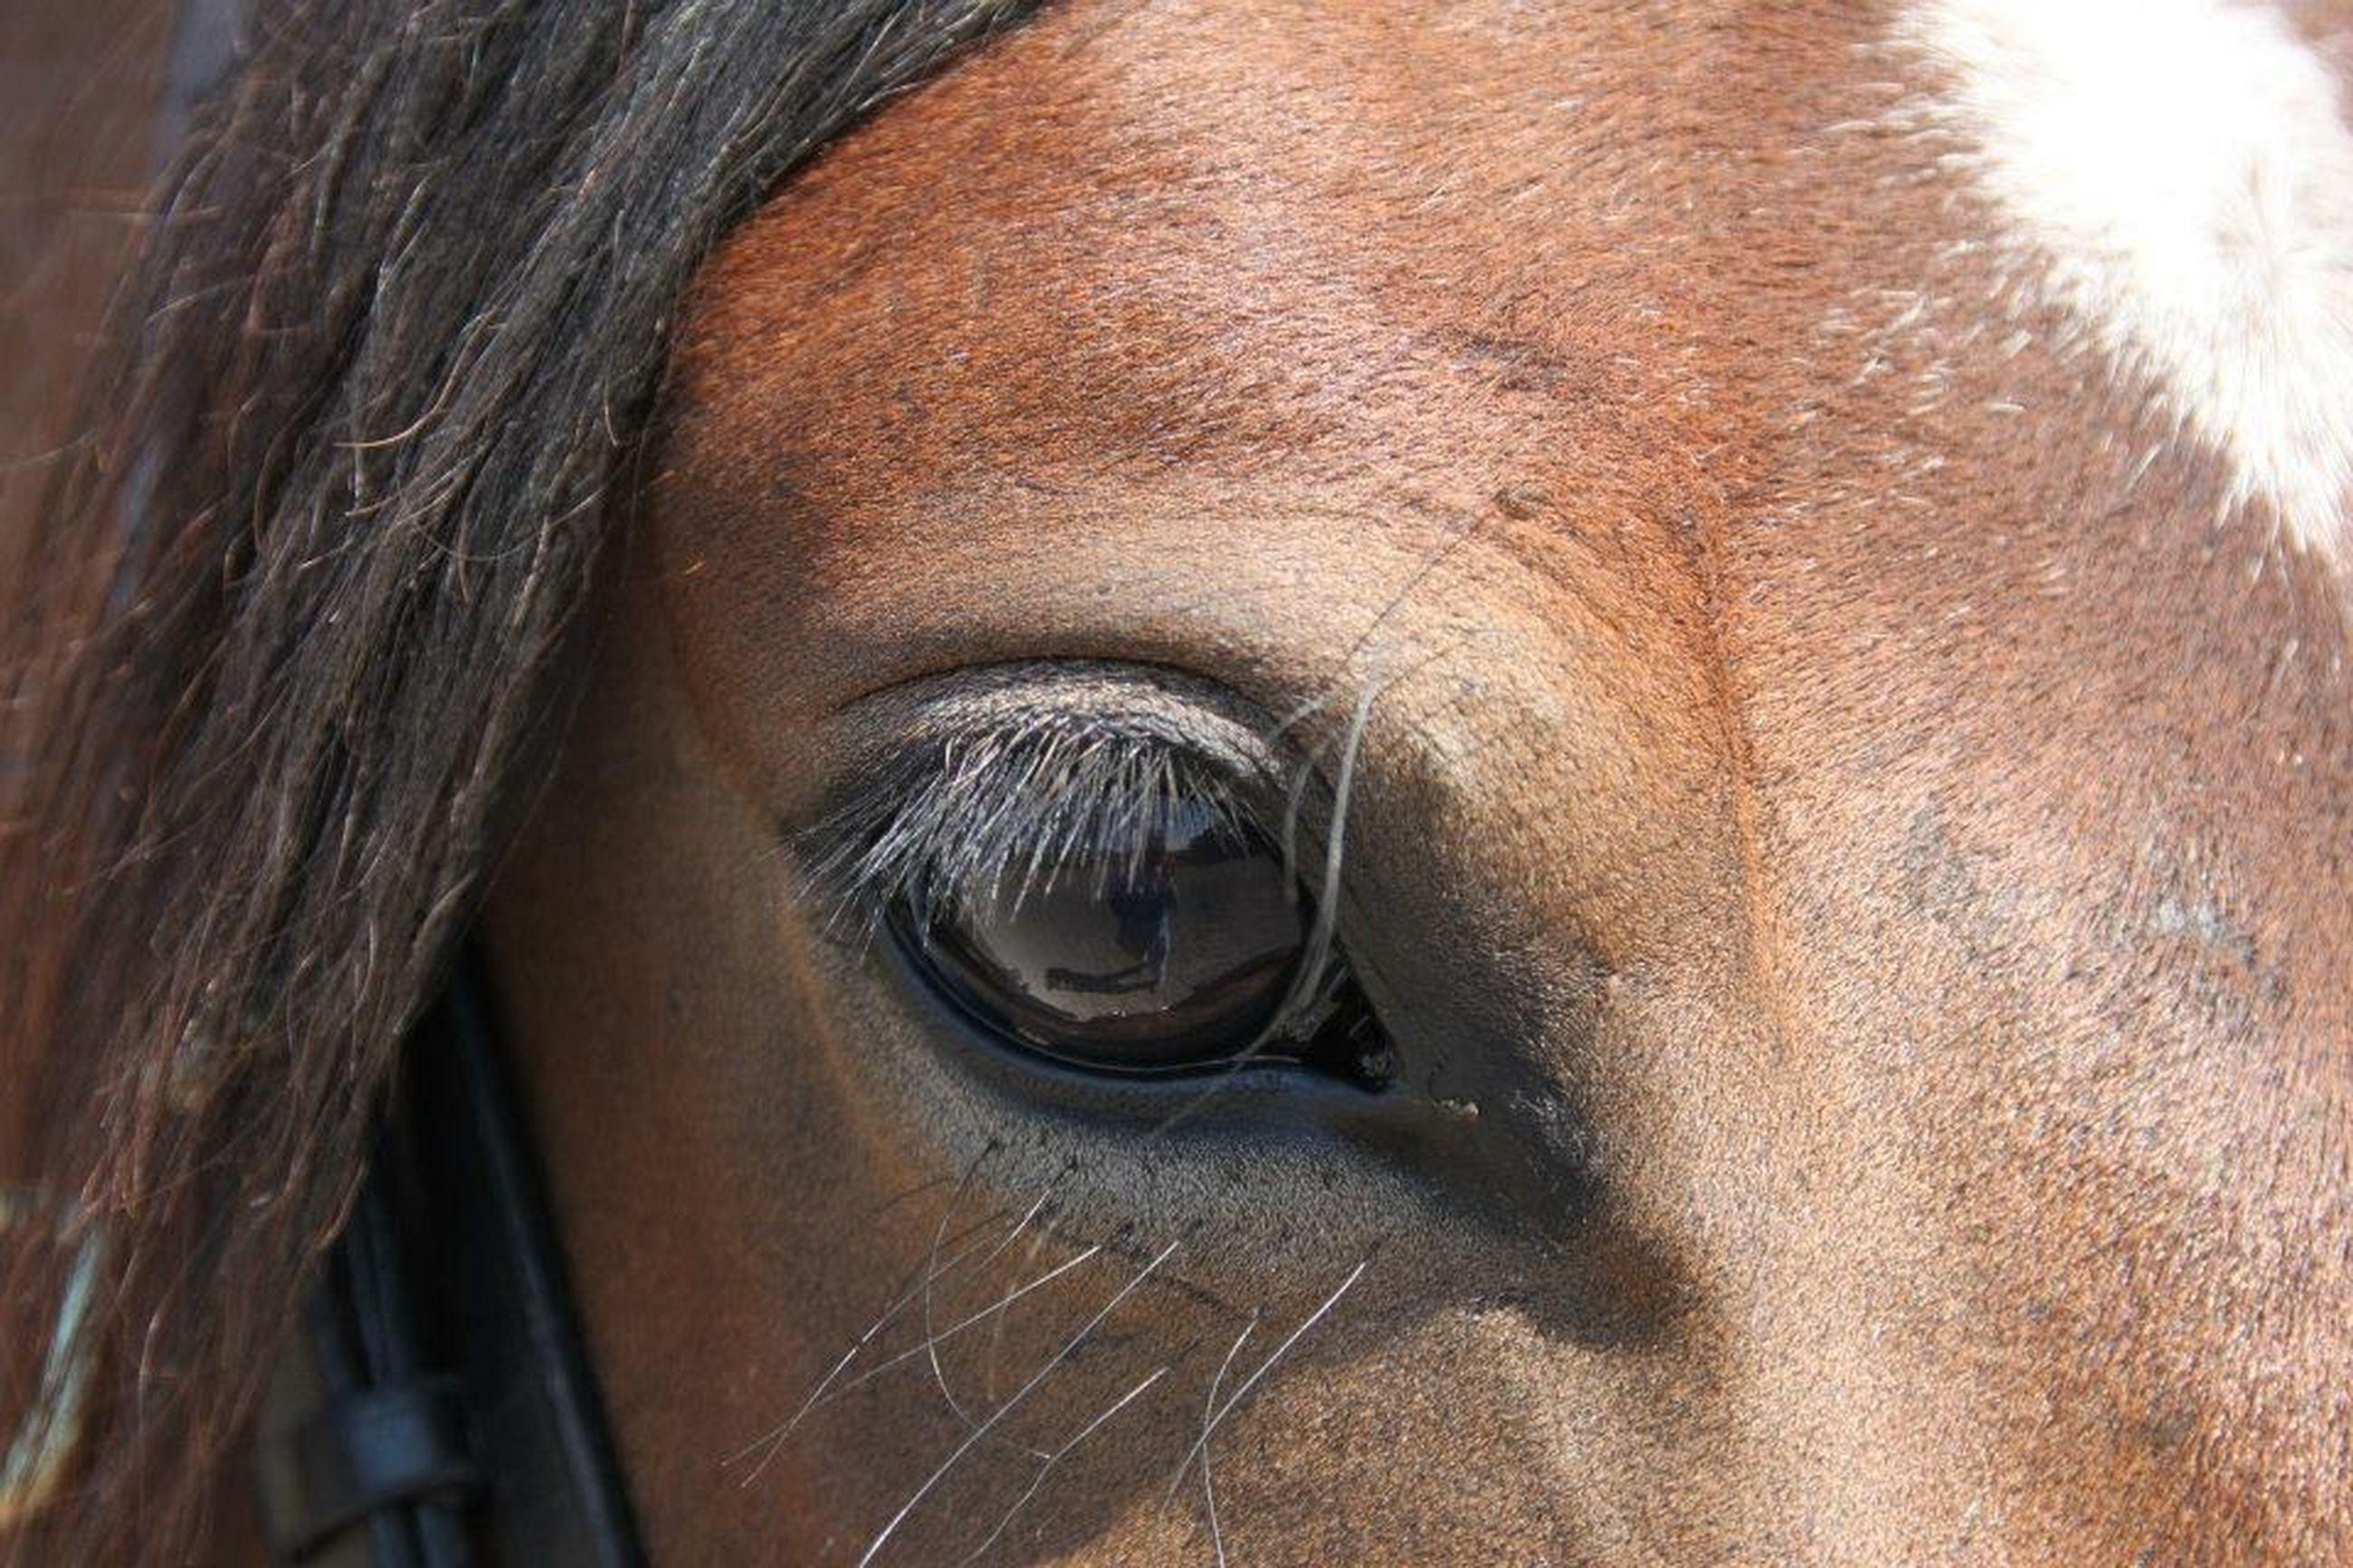 close-up, horse, part of, portrait, looking at camera, animal body part, headshot, one animal, animal themes, mammal, animal head, domestic animals, human face, front view, indoors, human eye, animal eye